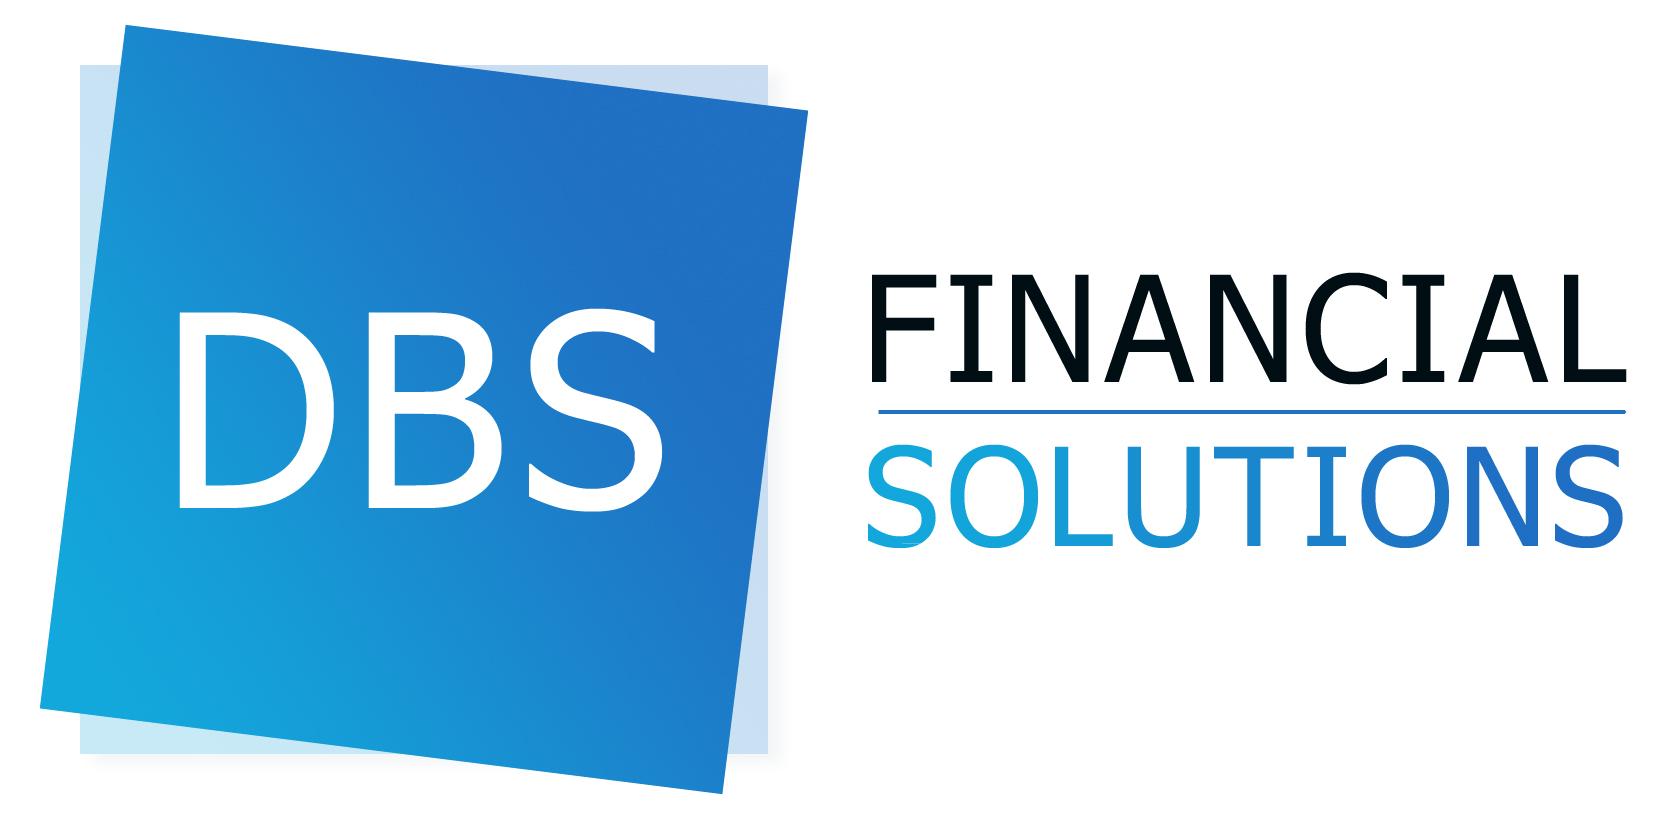 DBS Financial Solutions - Basildon, Essex